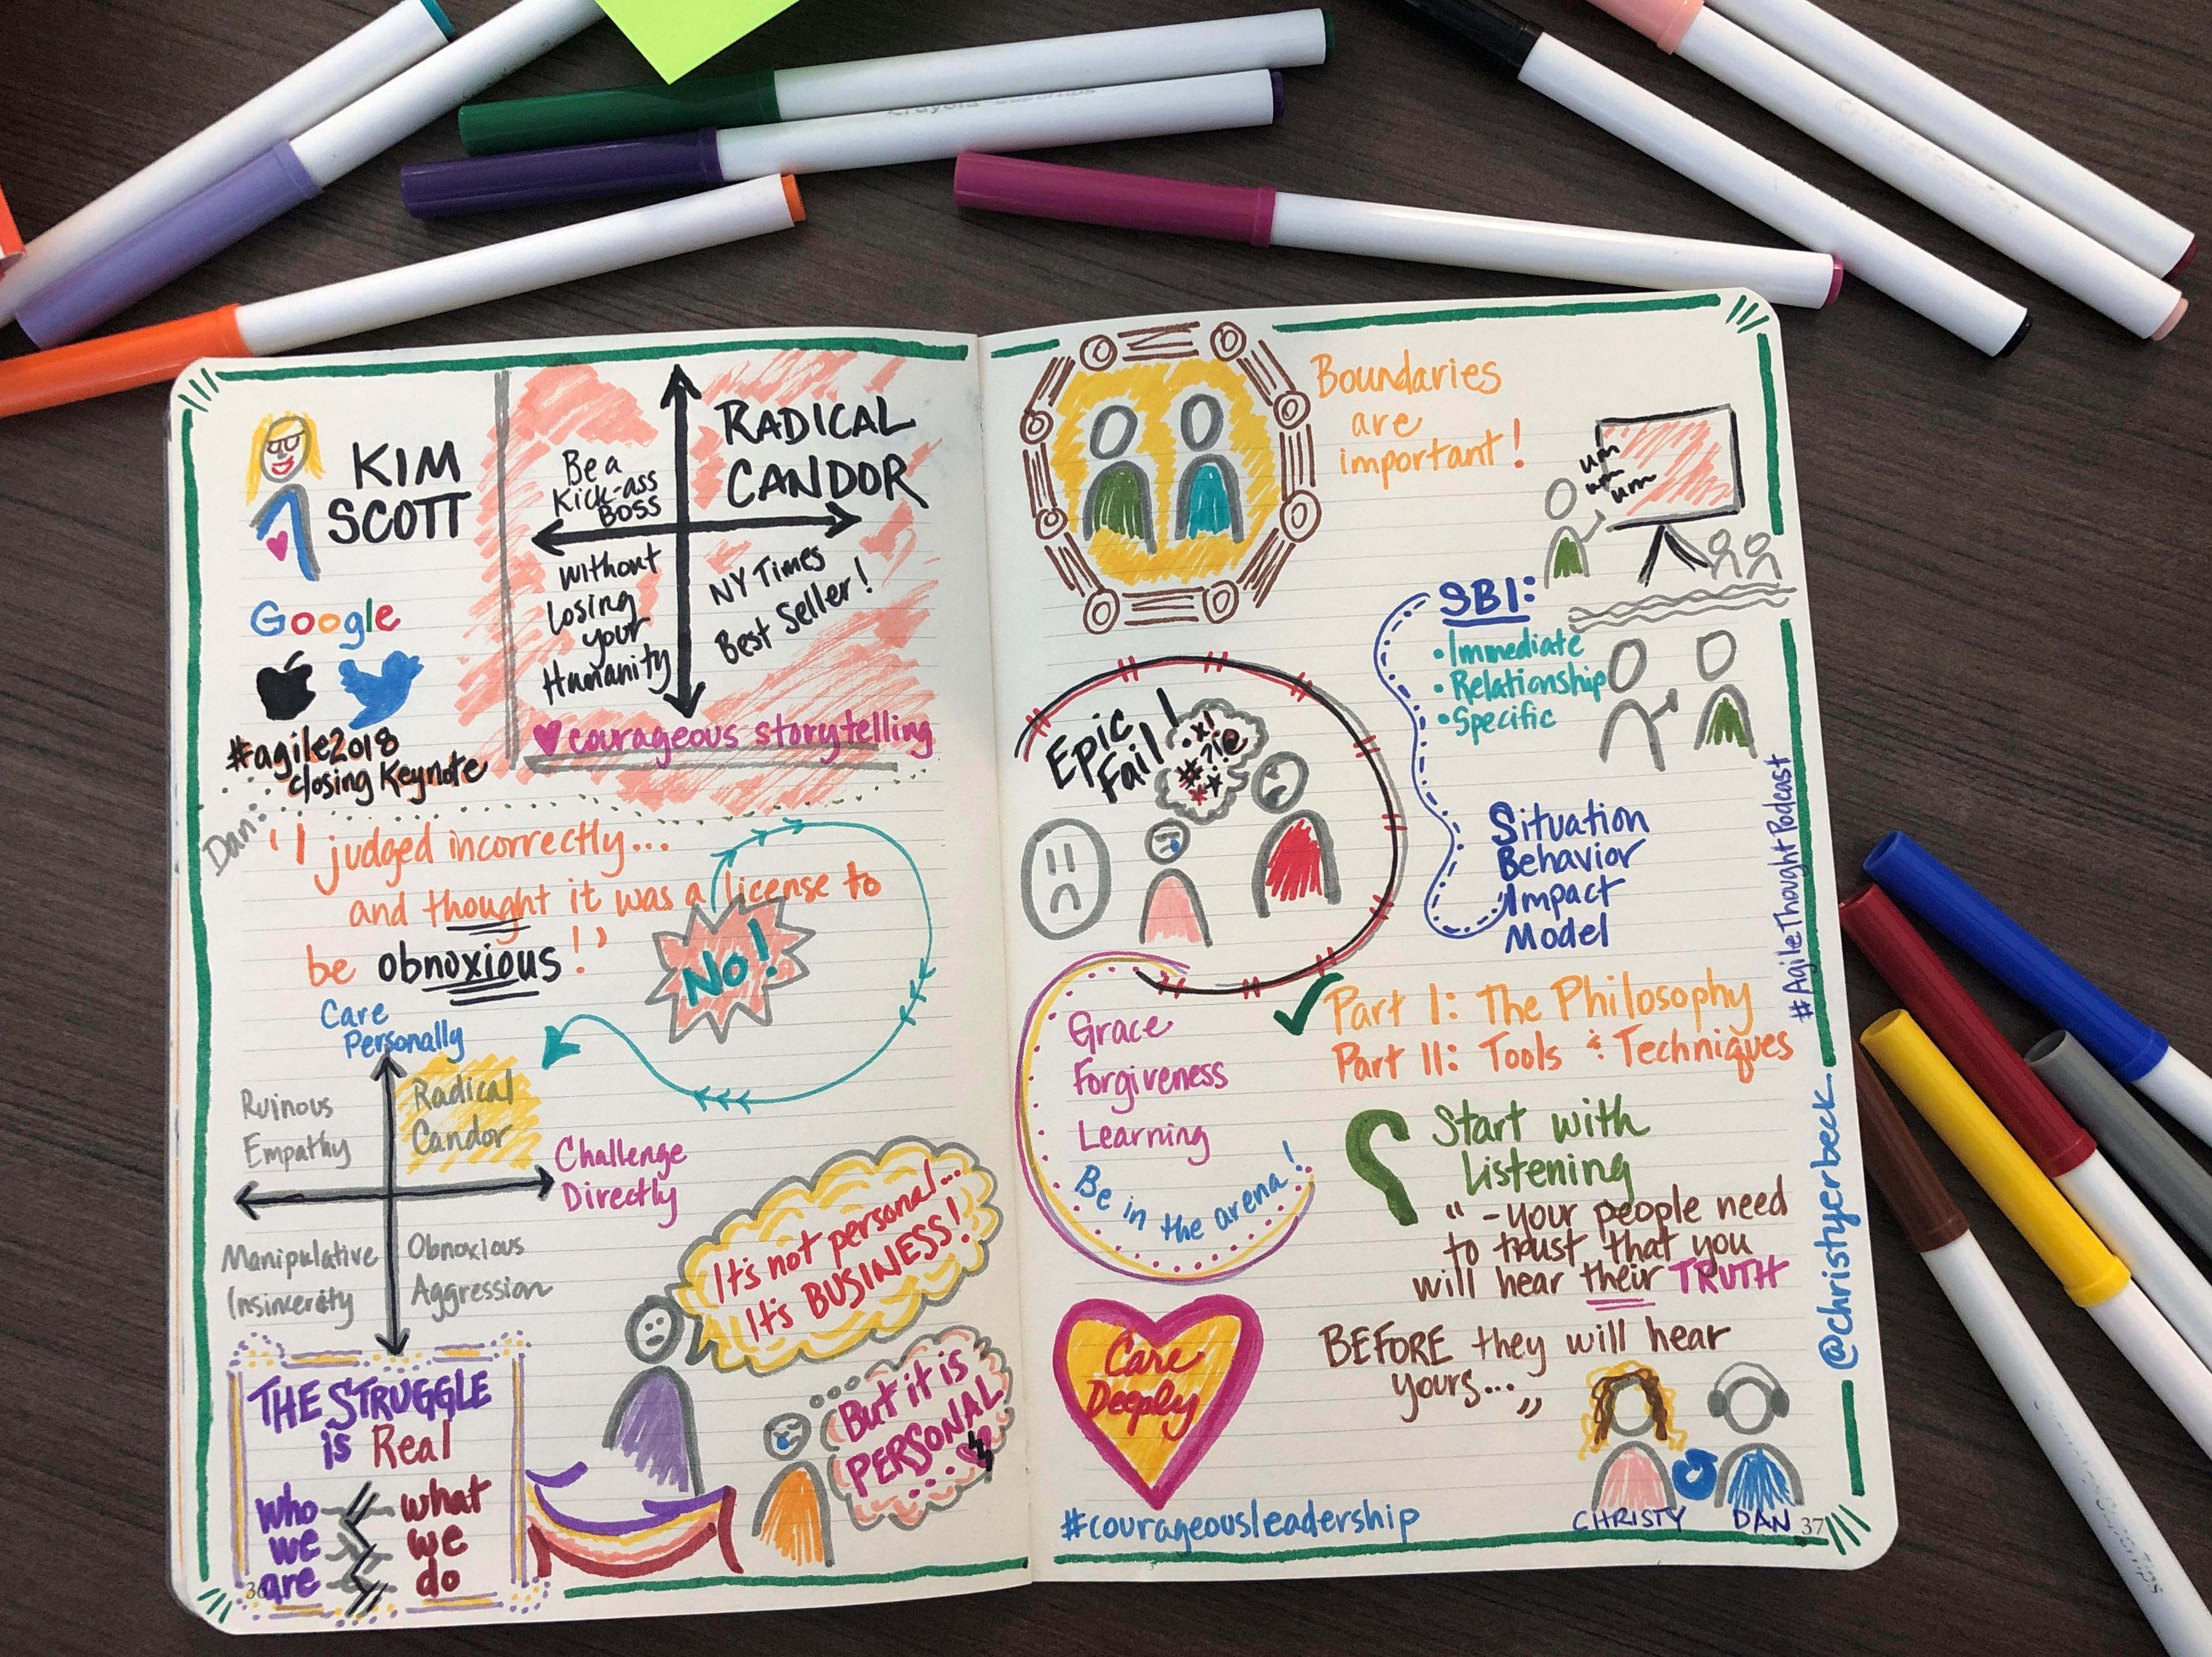 Radical Candor Sketch Note